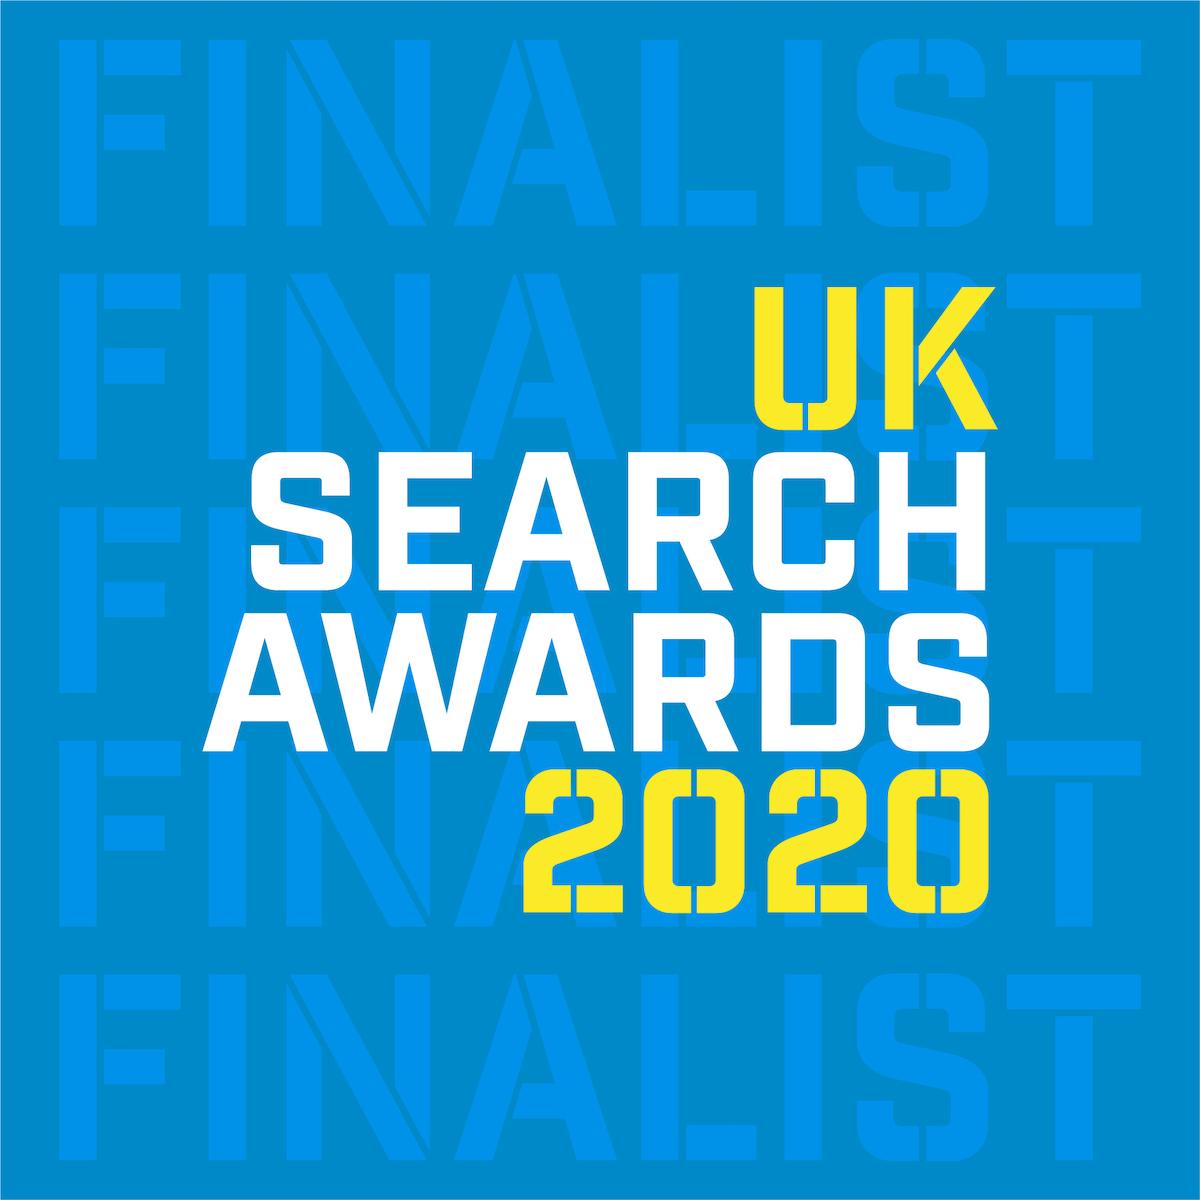 Search Awards UK 2020